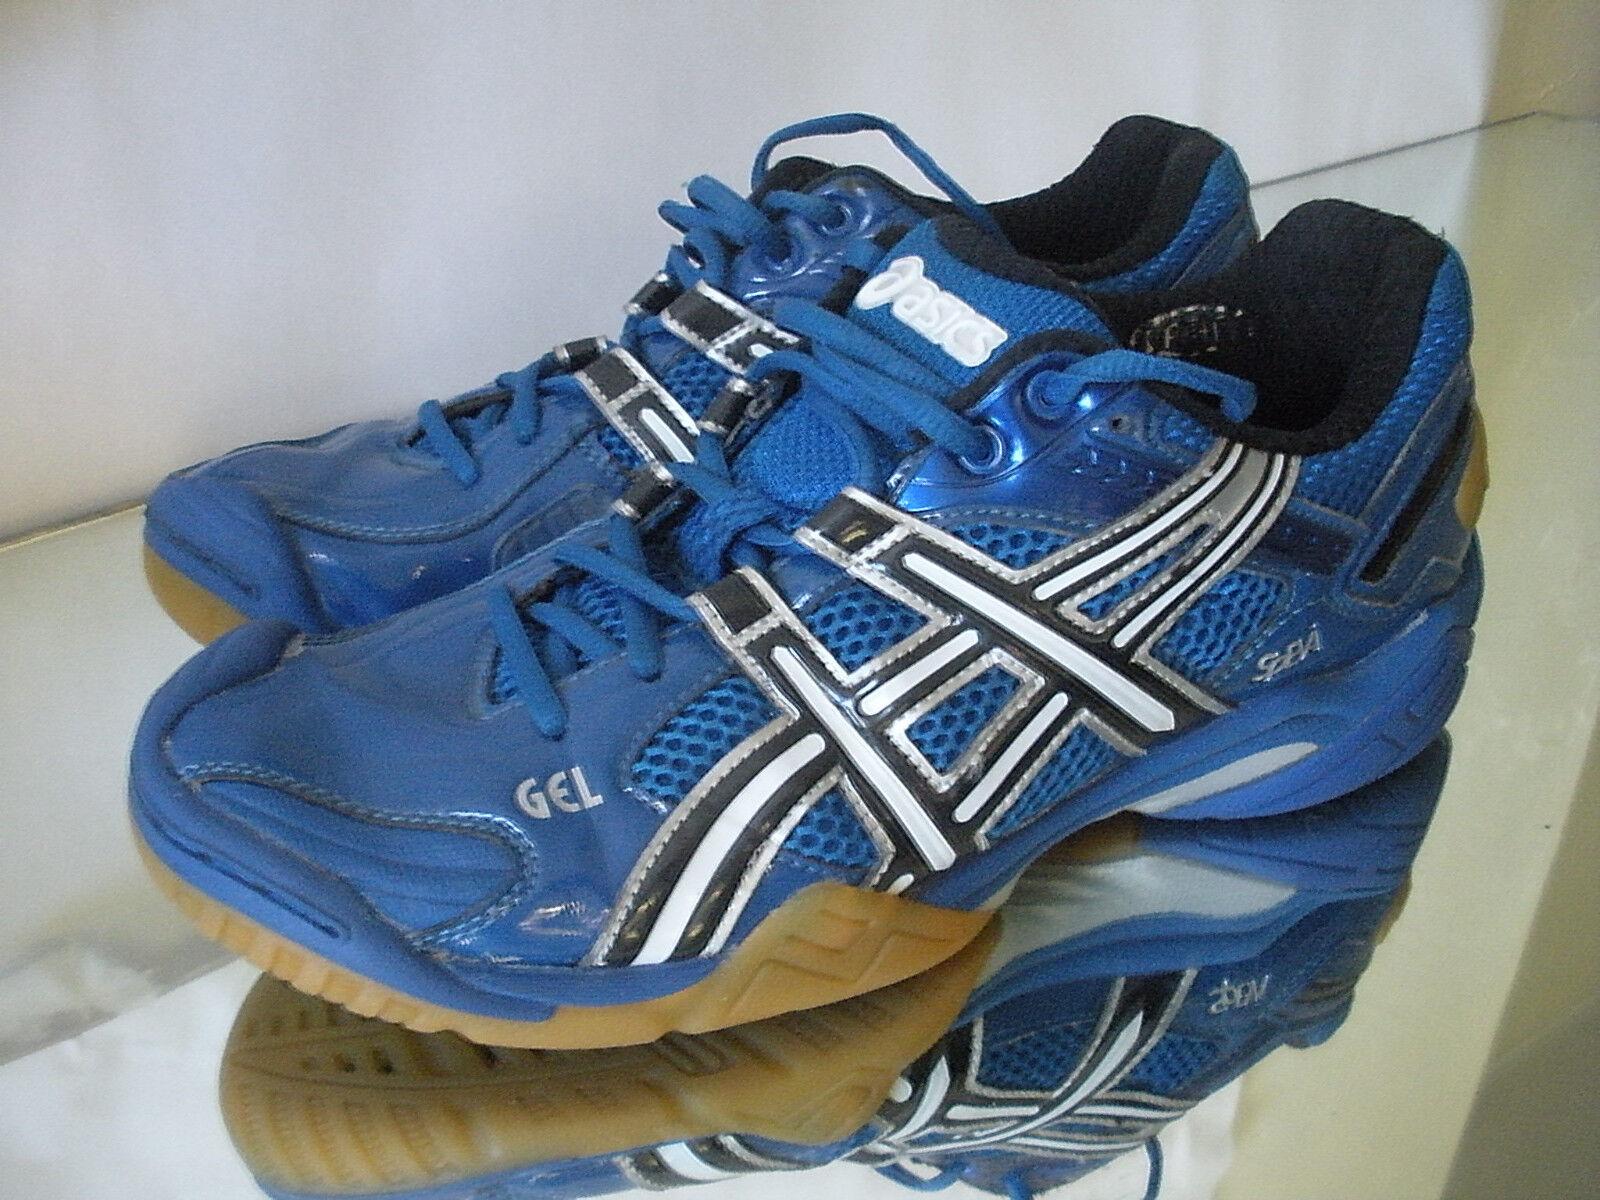 azul ASICS para hombre GEL-Domain 2 Court Voleibol Tenis Zapatos EE. UU.